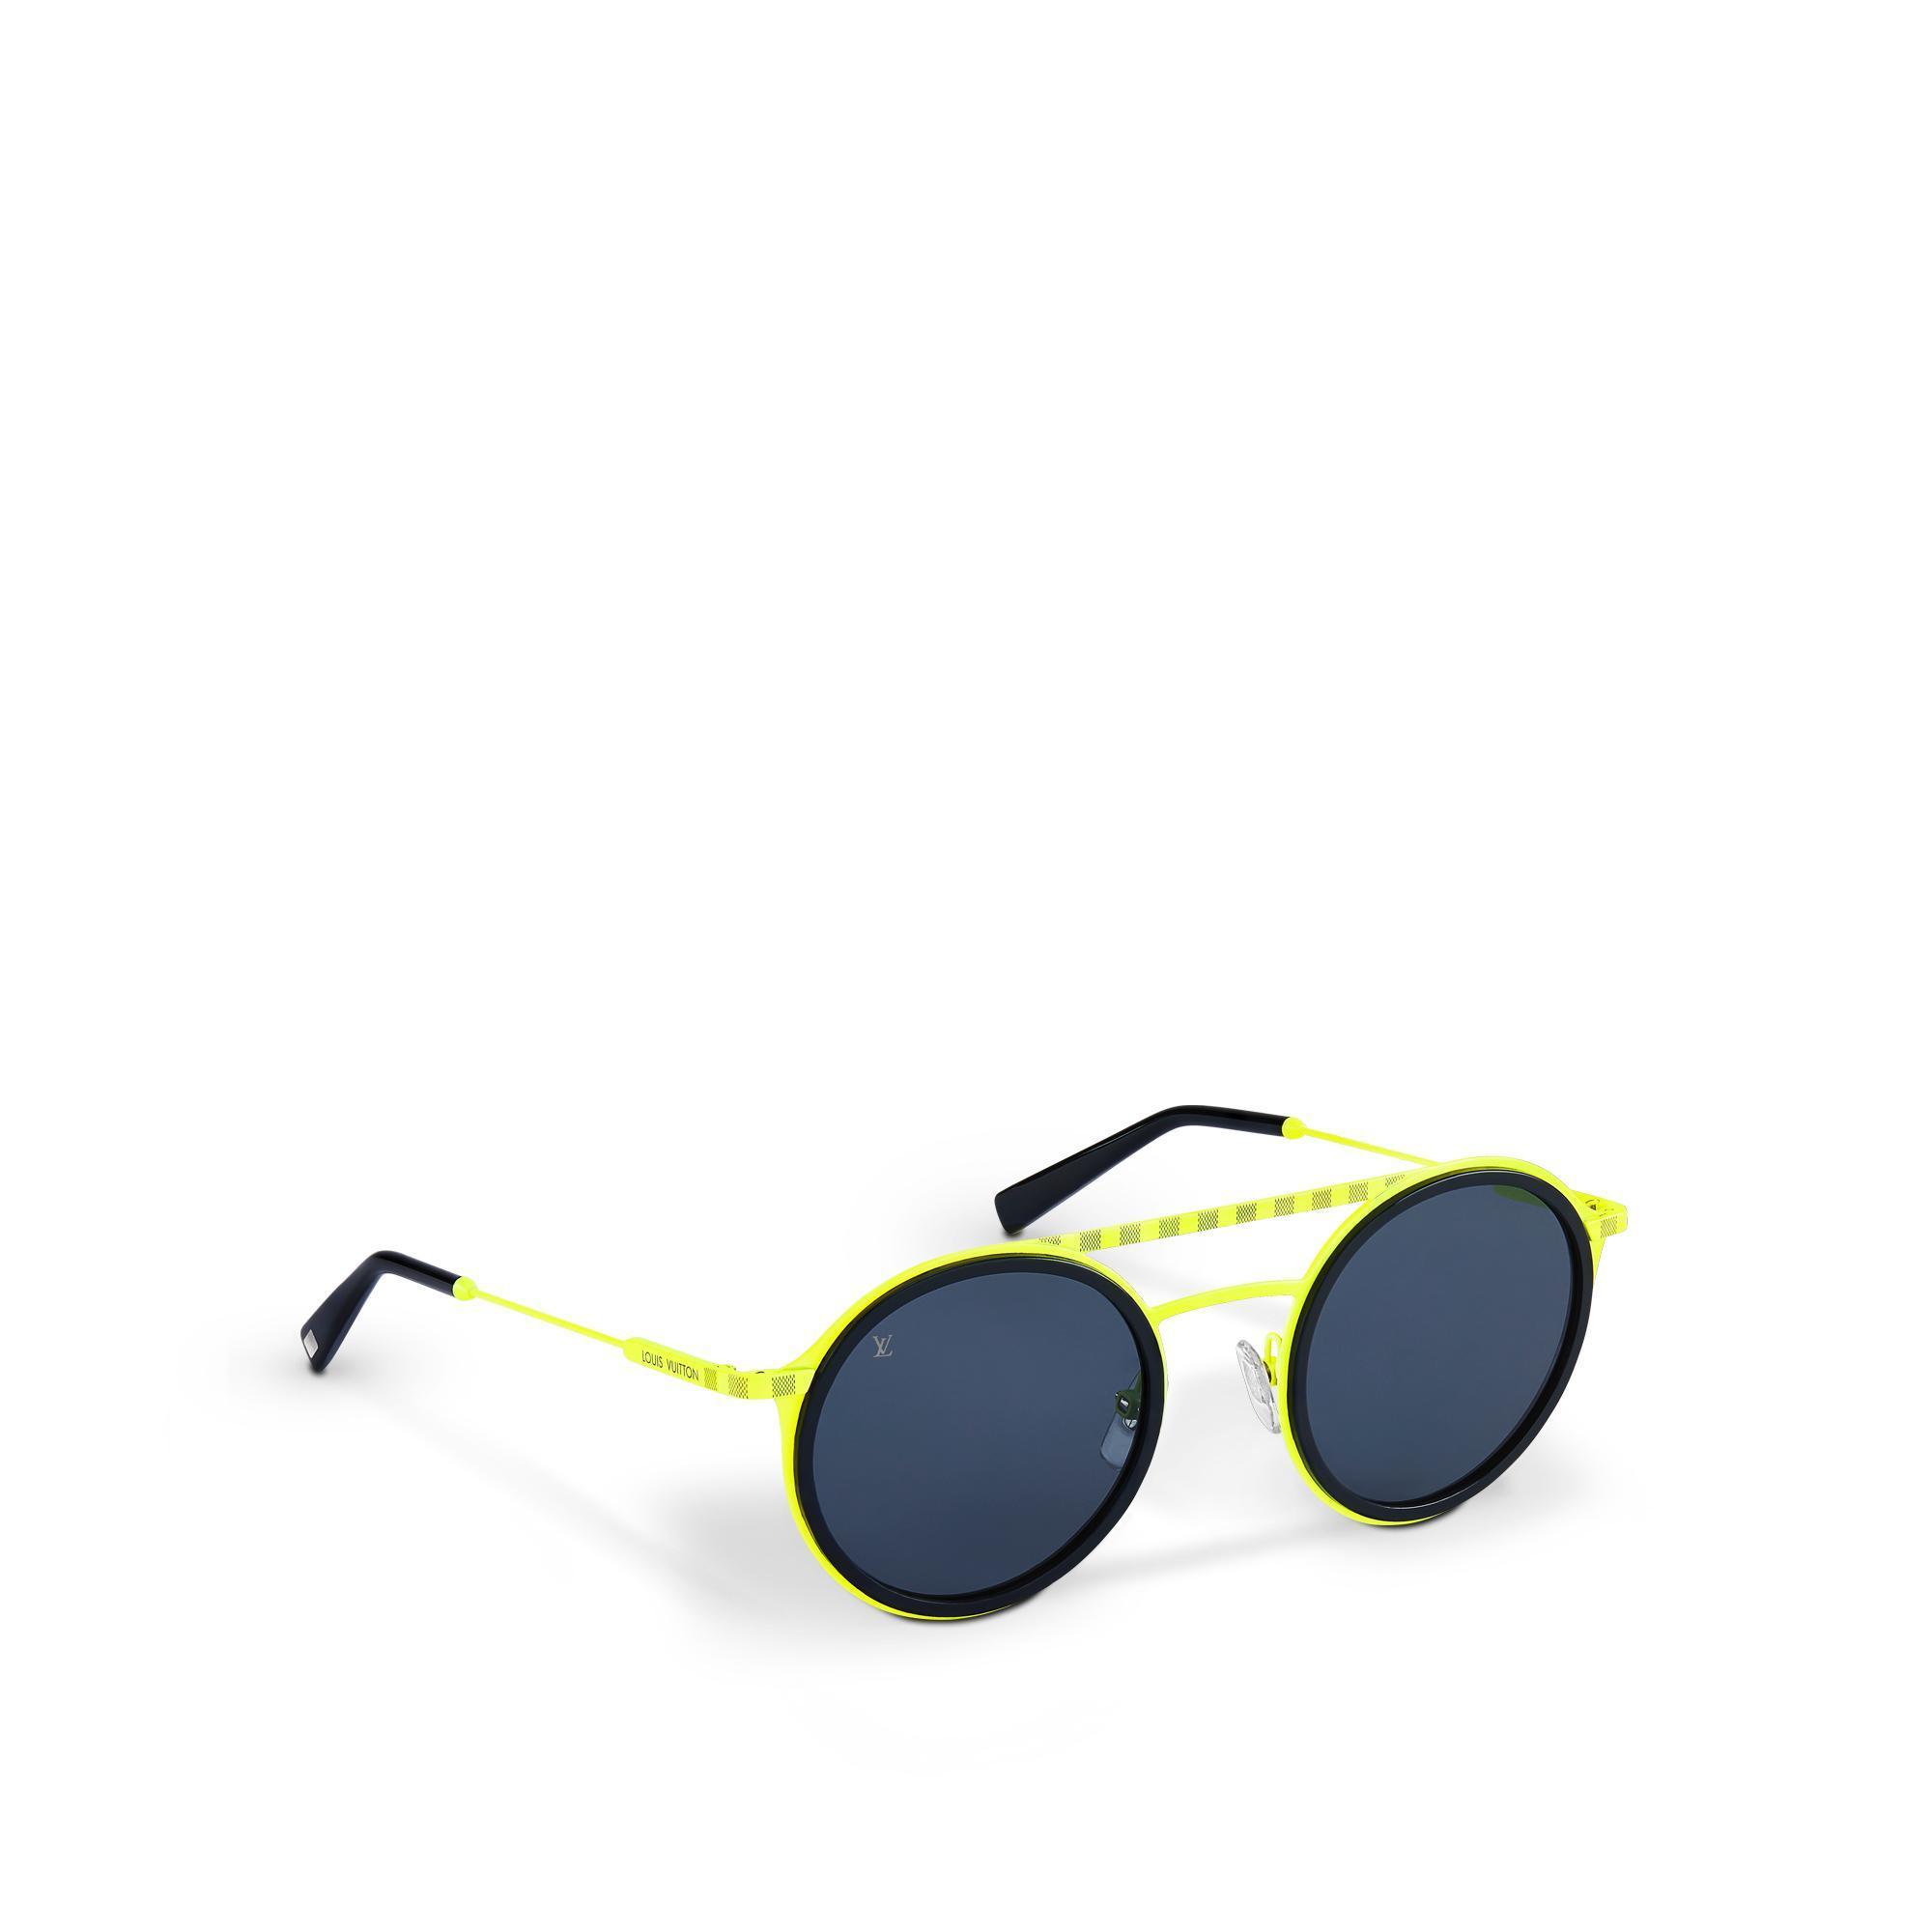 2d5e4cf16c2 Louis Vuitton Damier Shuffle | ModeSens